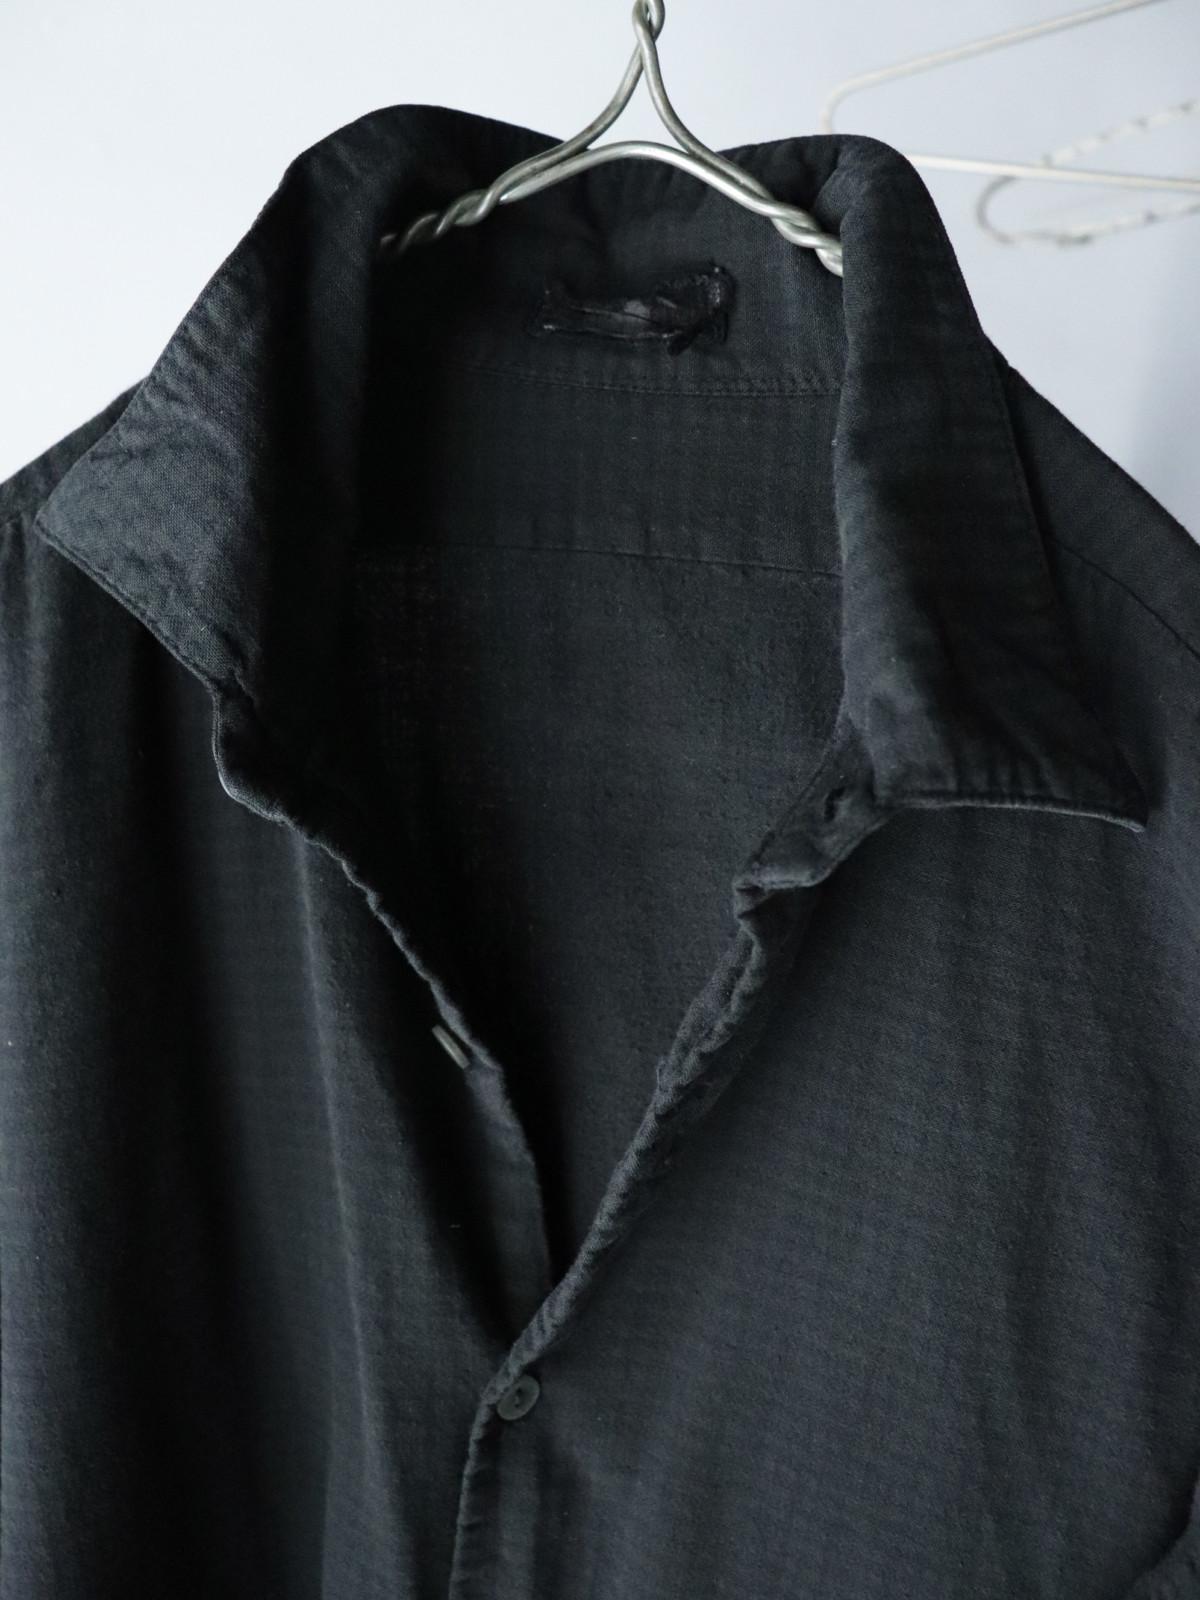 Black-dyed , long shirts,europe